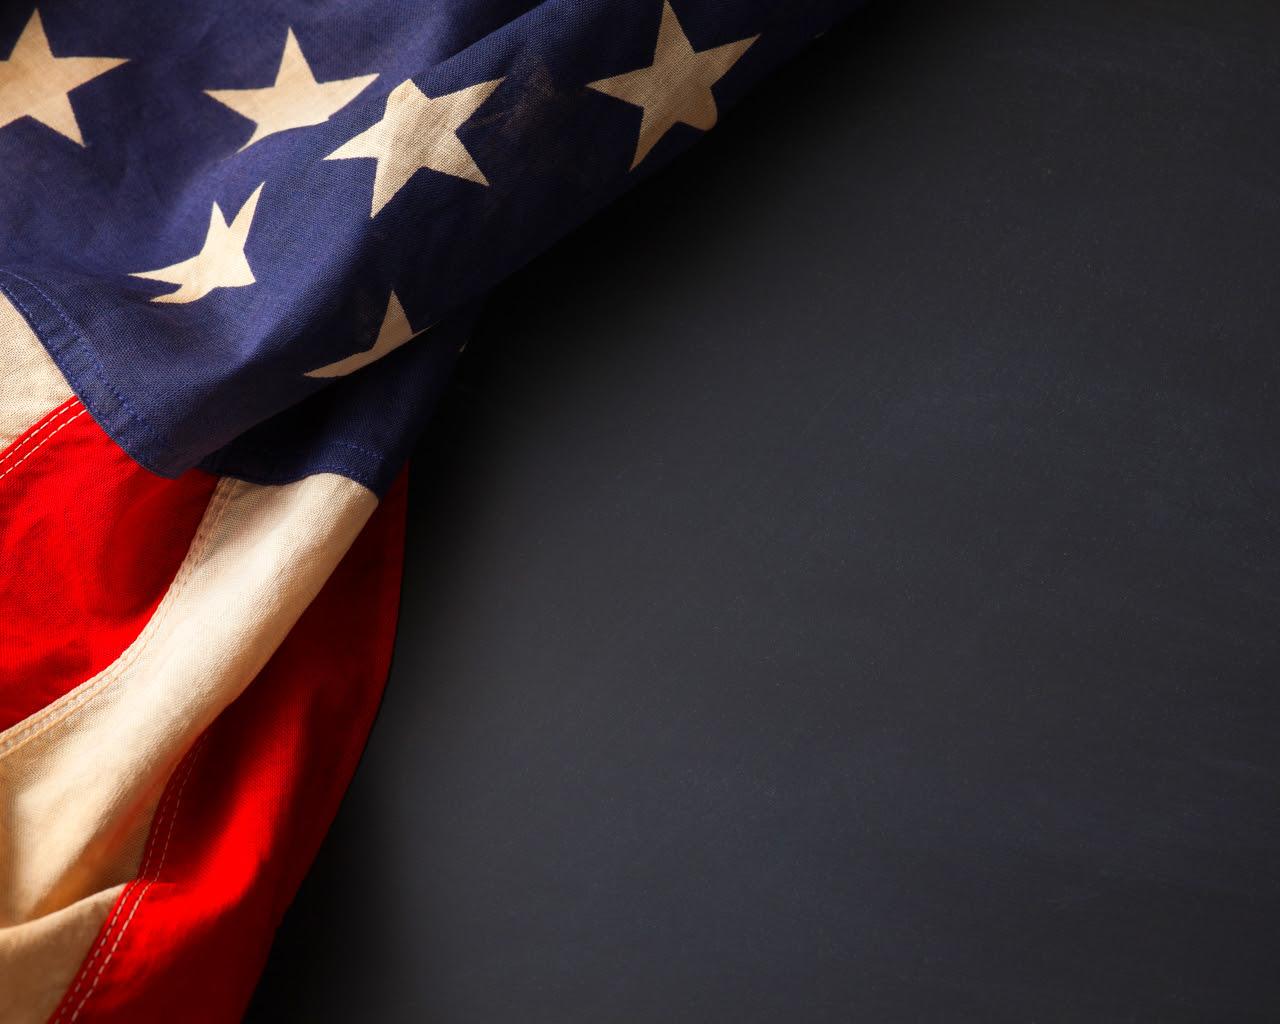 American Flag United States Of America Wallpaper 40448771 Fanpop